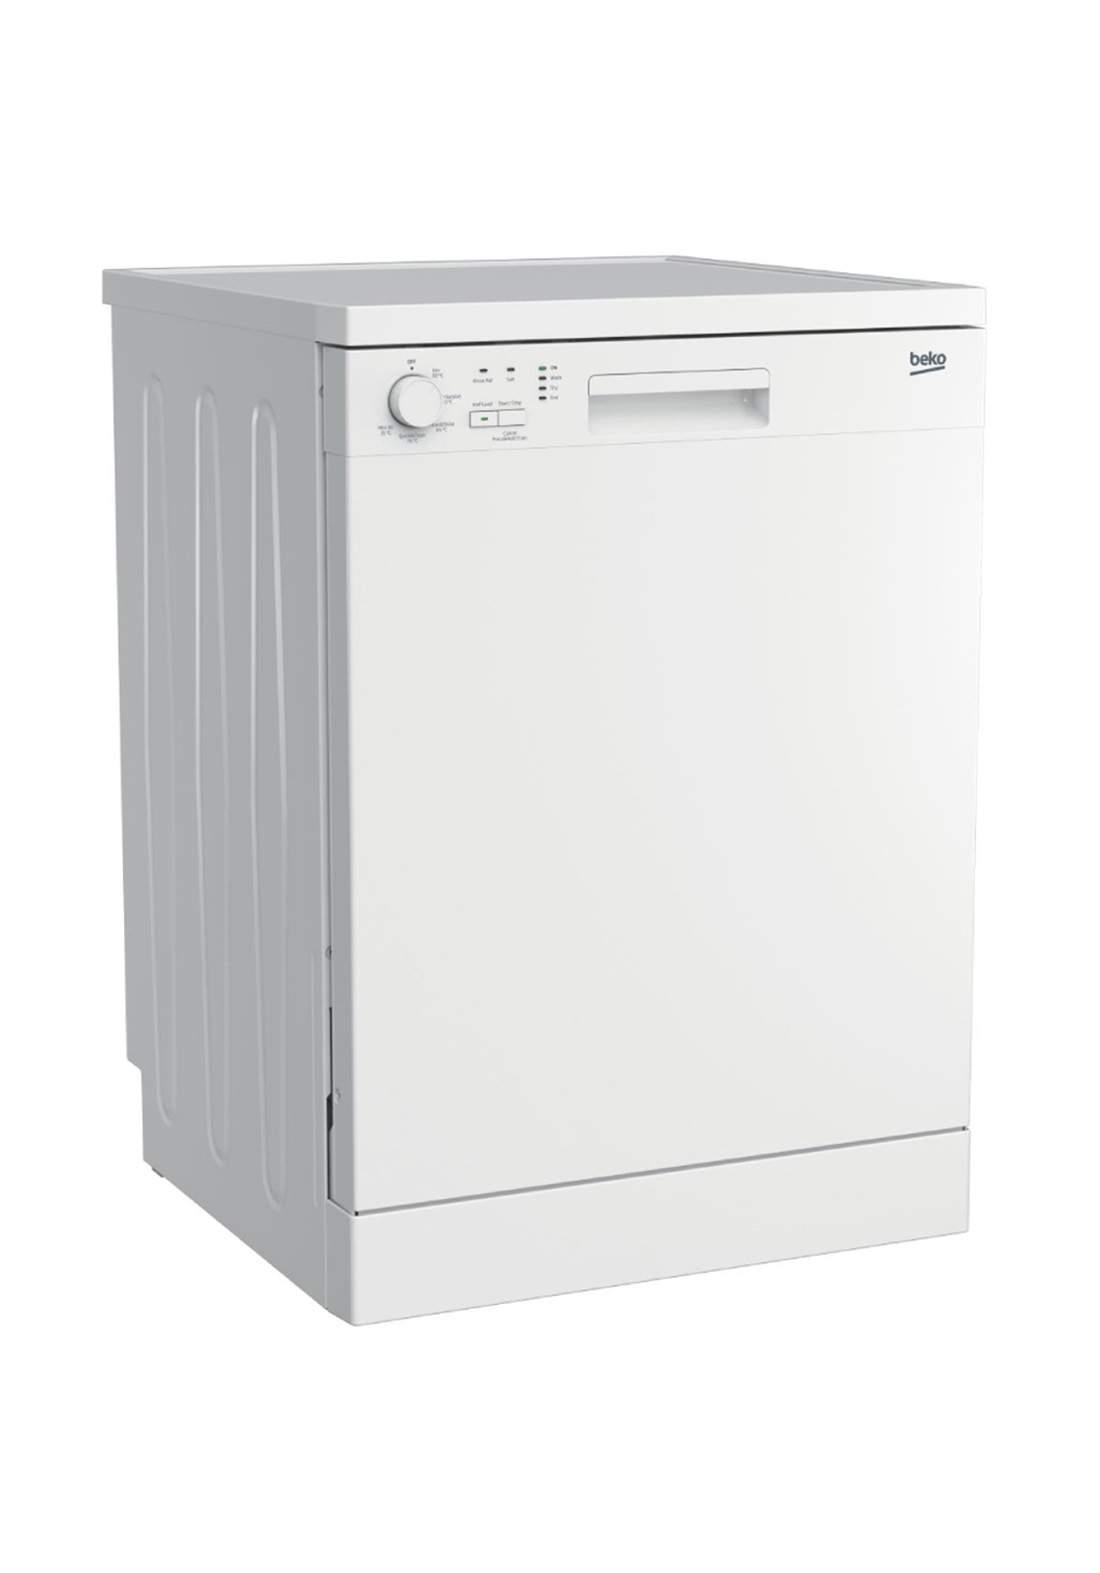 Beko DFN 05210 W Dishwasher 5 Programs Capacity Of 12 Sets - White غسالة صحون